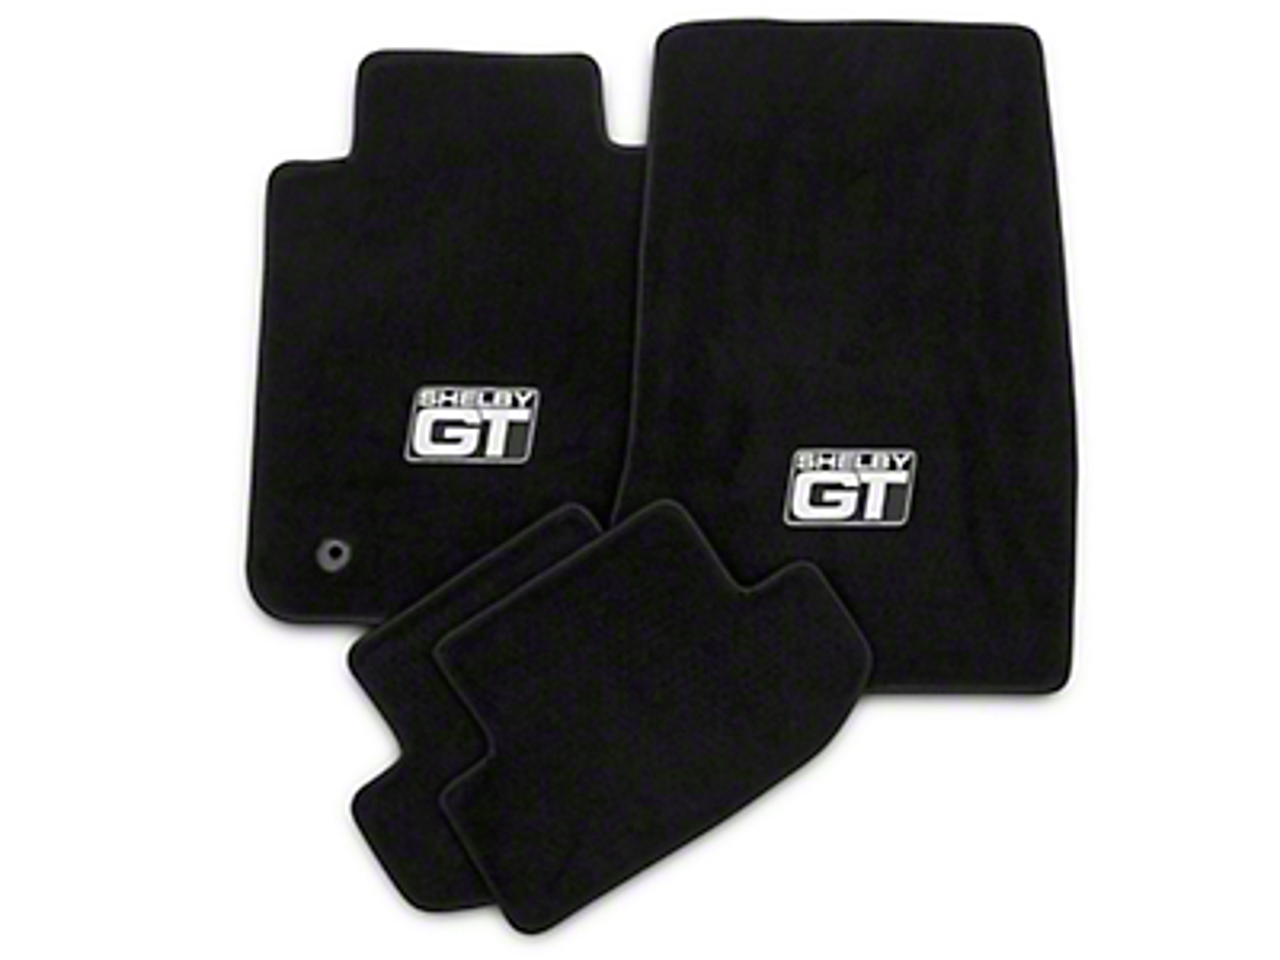 Lloyd Front & Rear Floor Mats w/ Shelby GT Logo - Black (15-17 All)